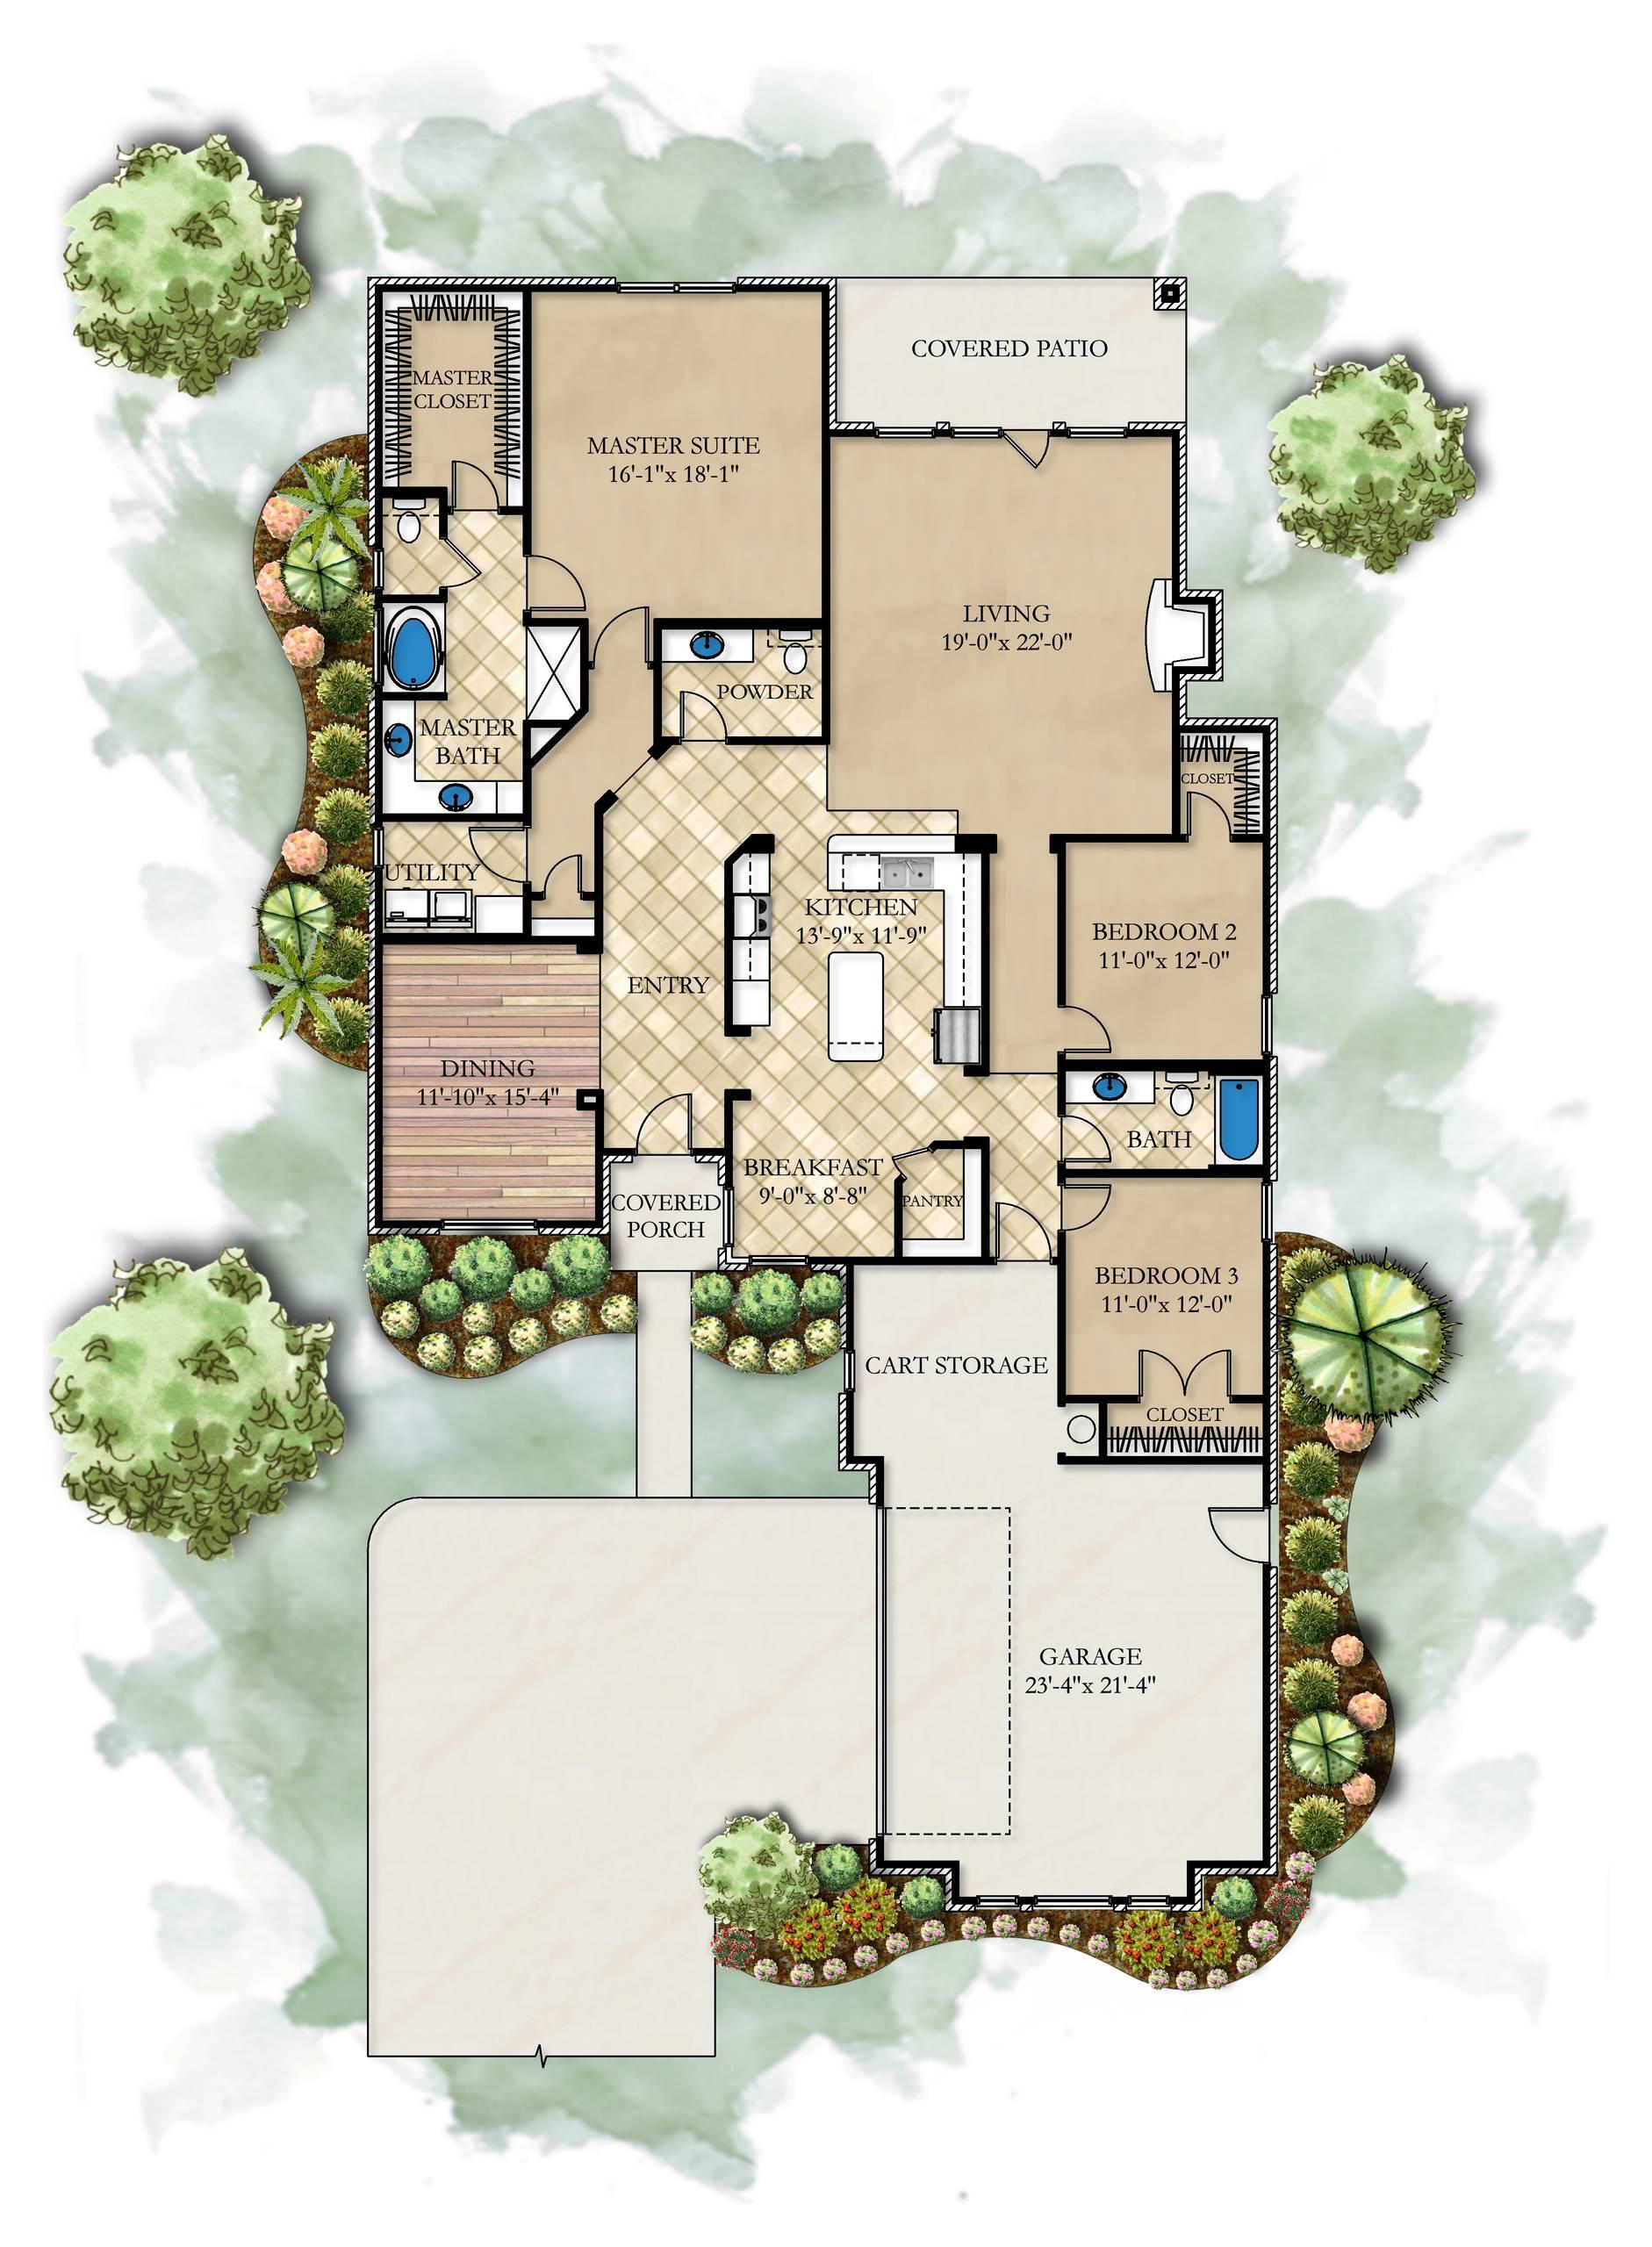 Seven Oaks (Plan 2530) - Edmond, OK